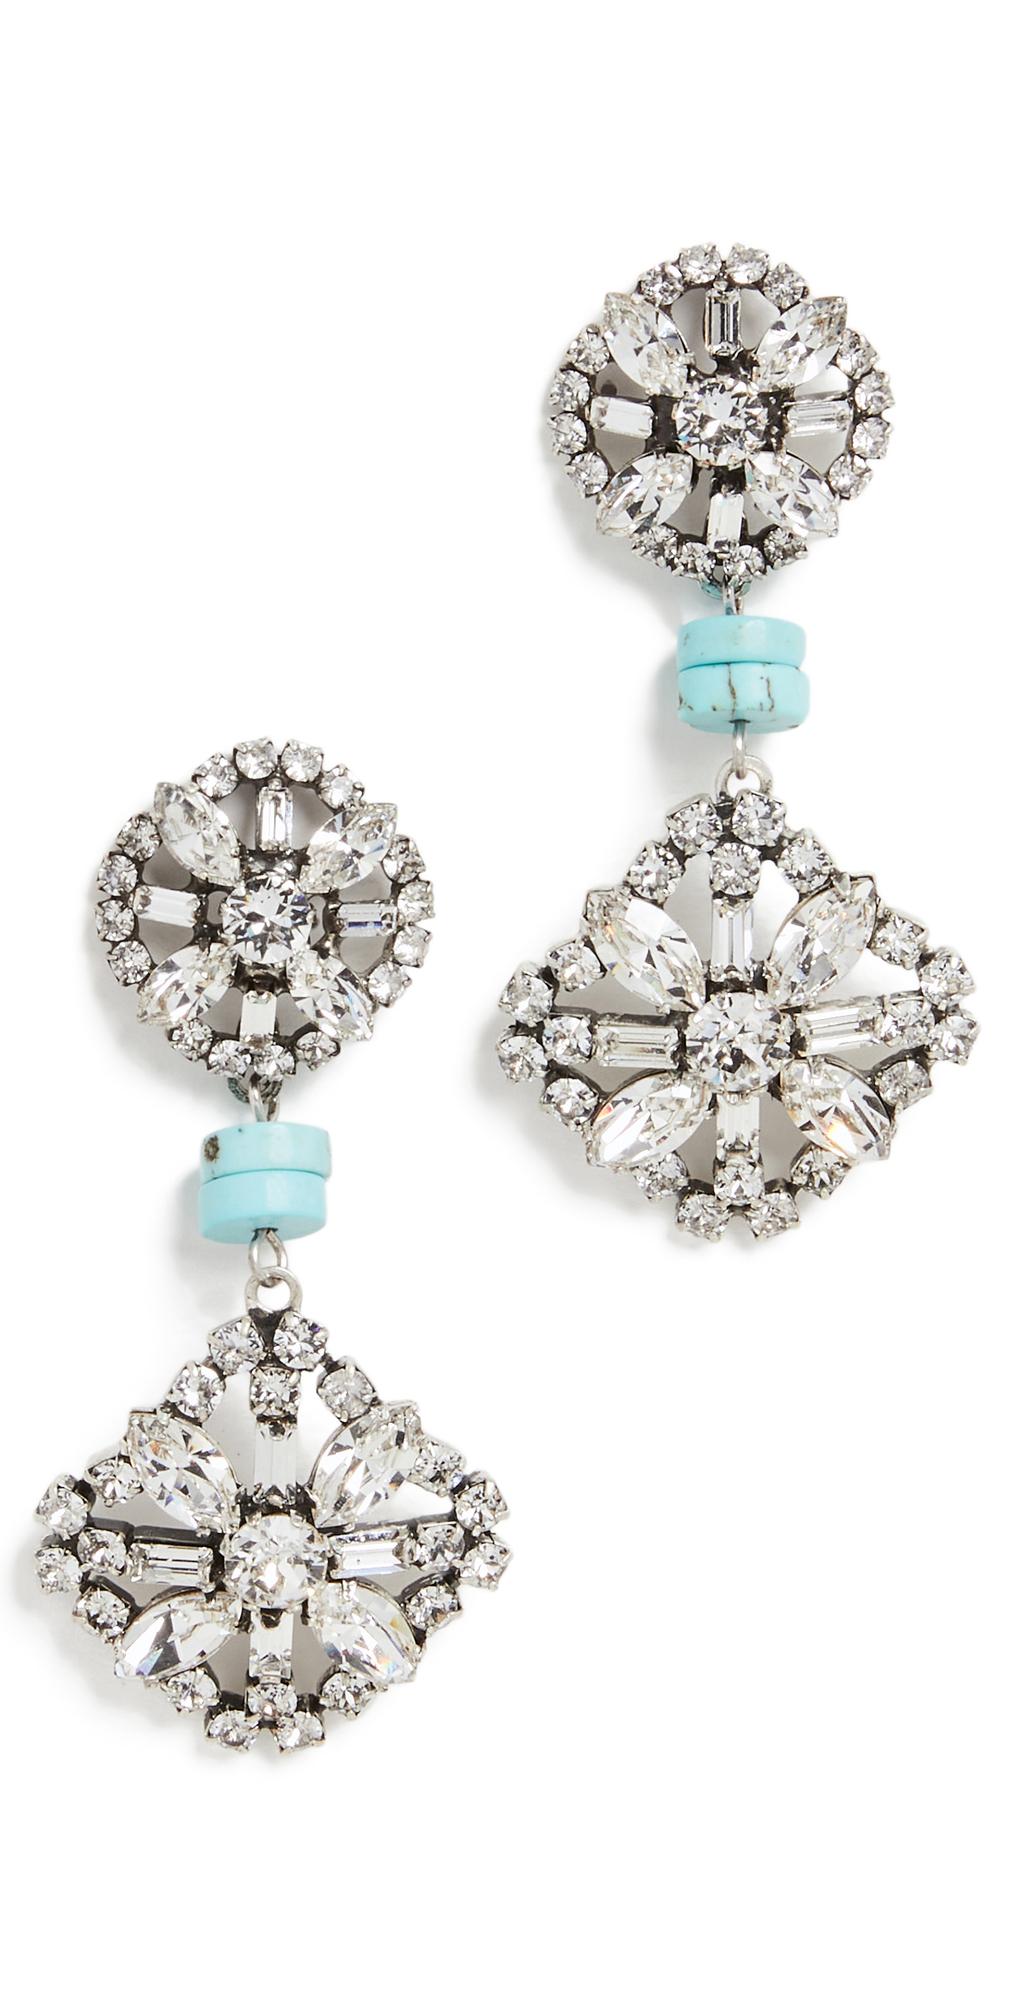 Jaws Earrings